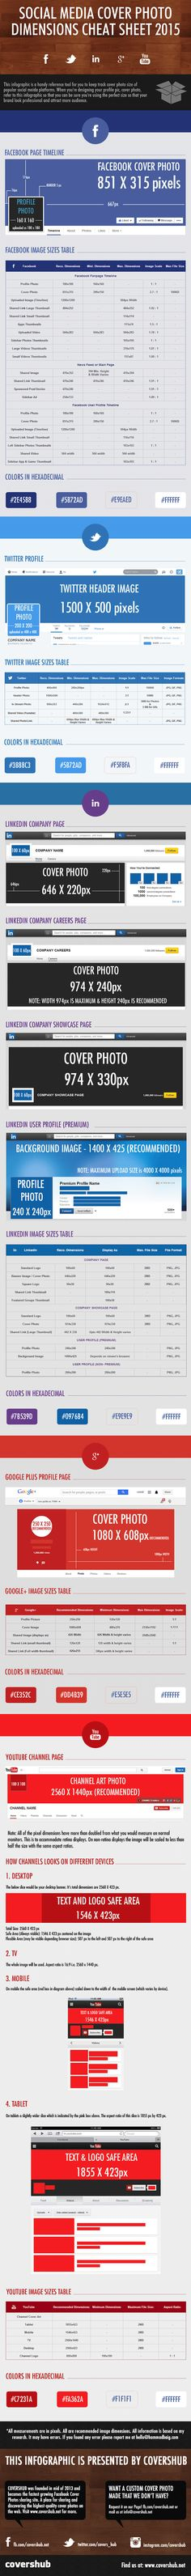 Social Media Cover Photo Dimensions Cheat Sheet 2015